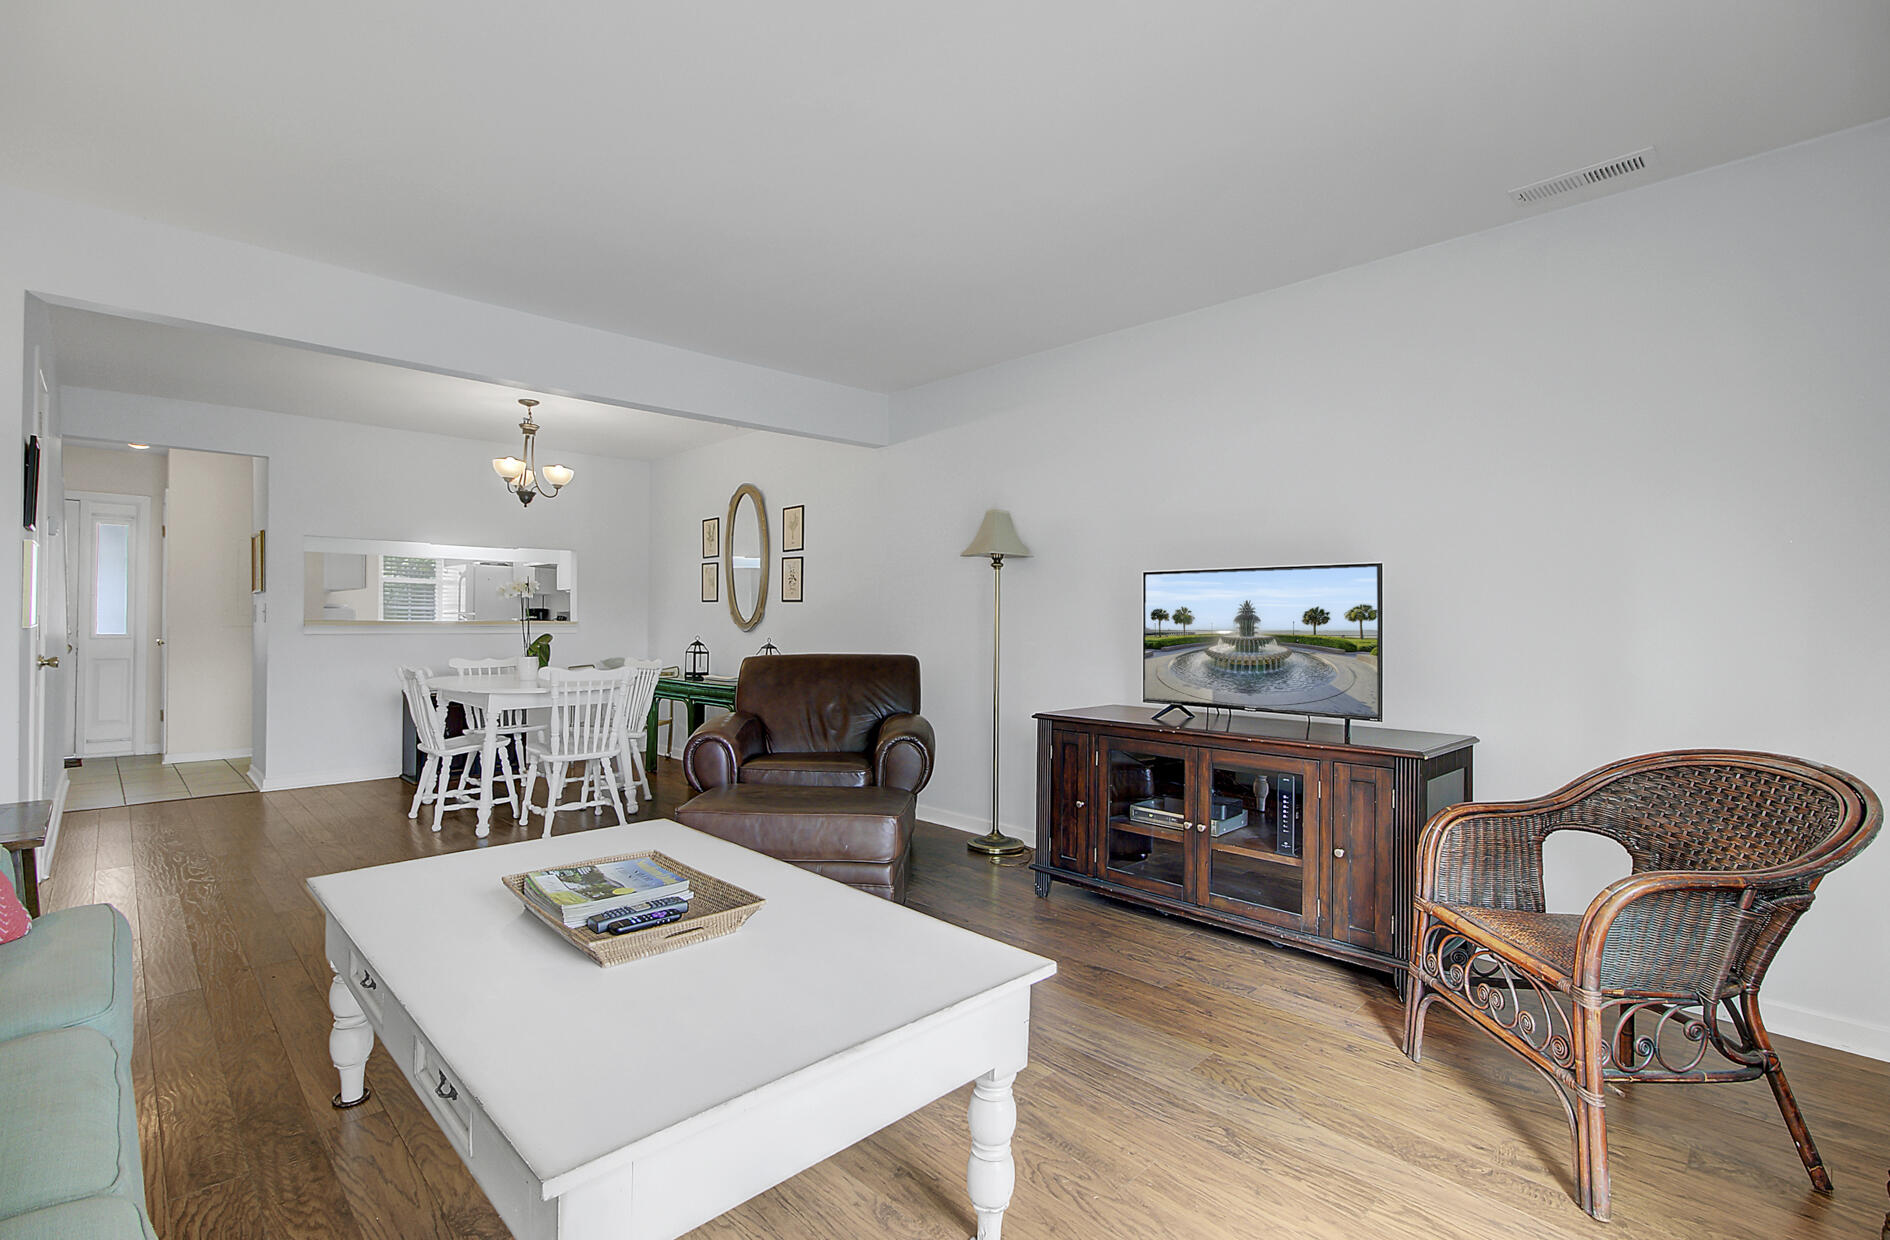 Riverland Place Homes For Sale - 234 Stefan, Charleston, SC - 12